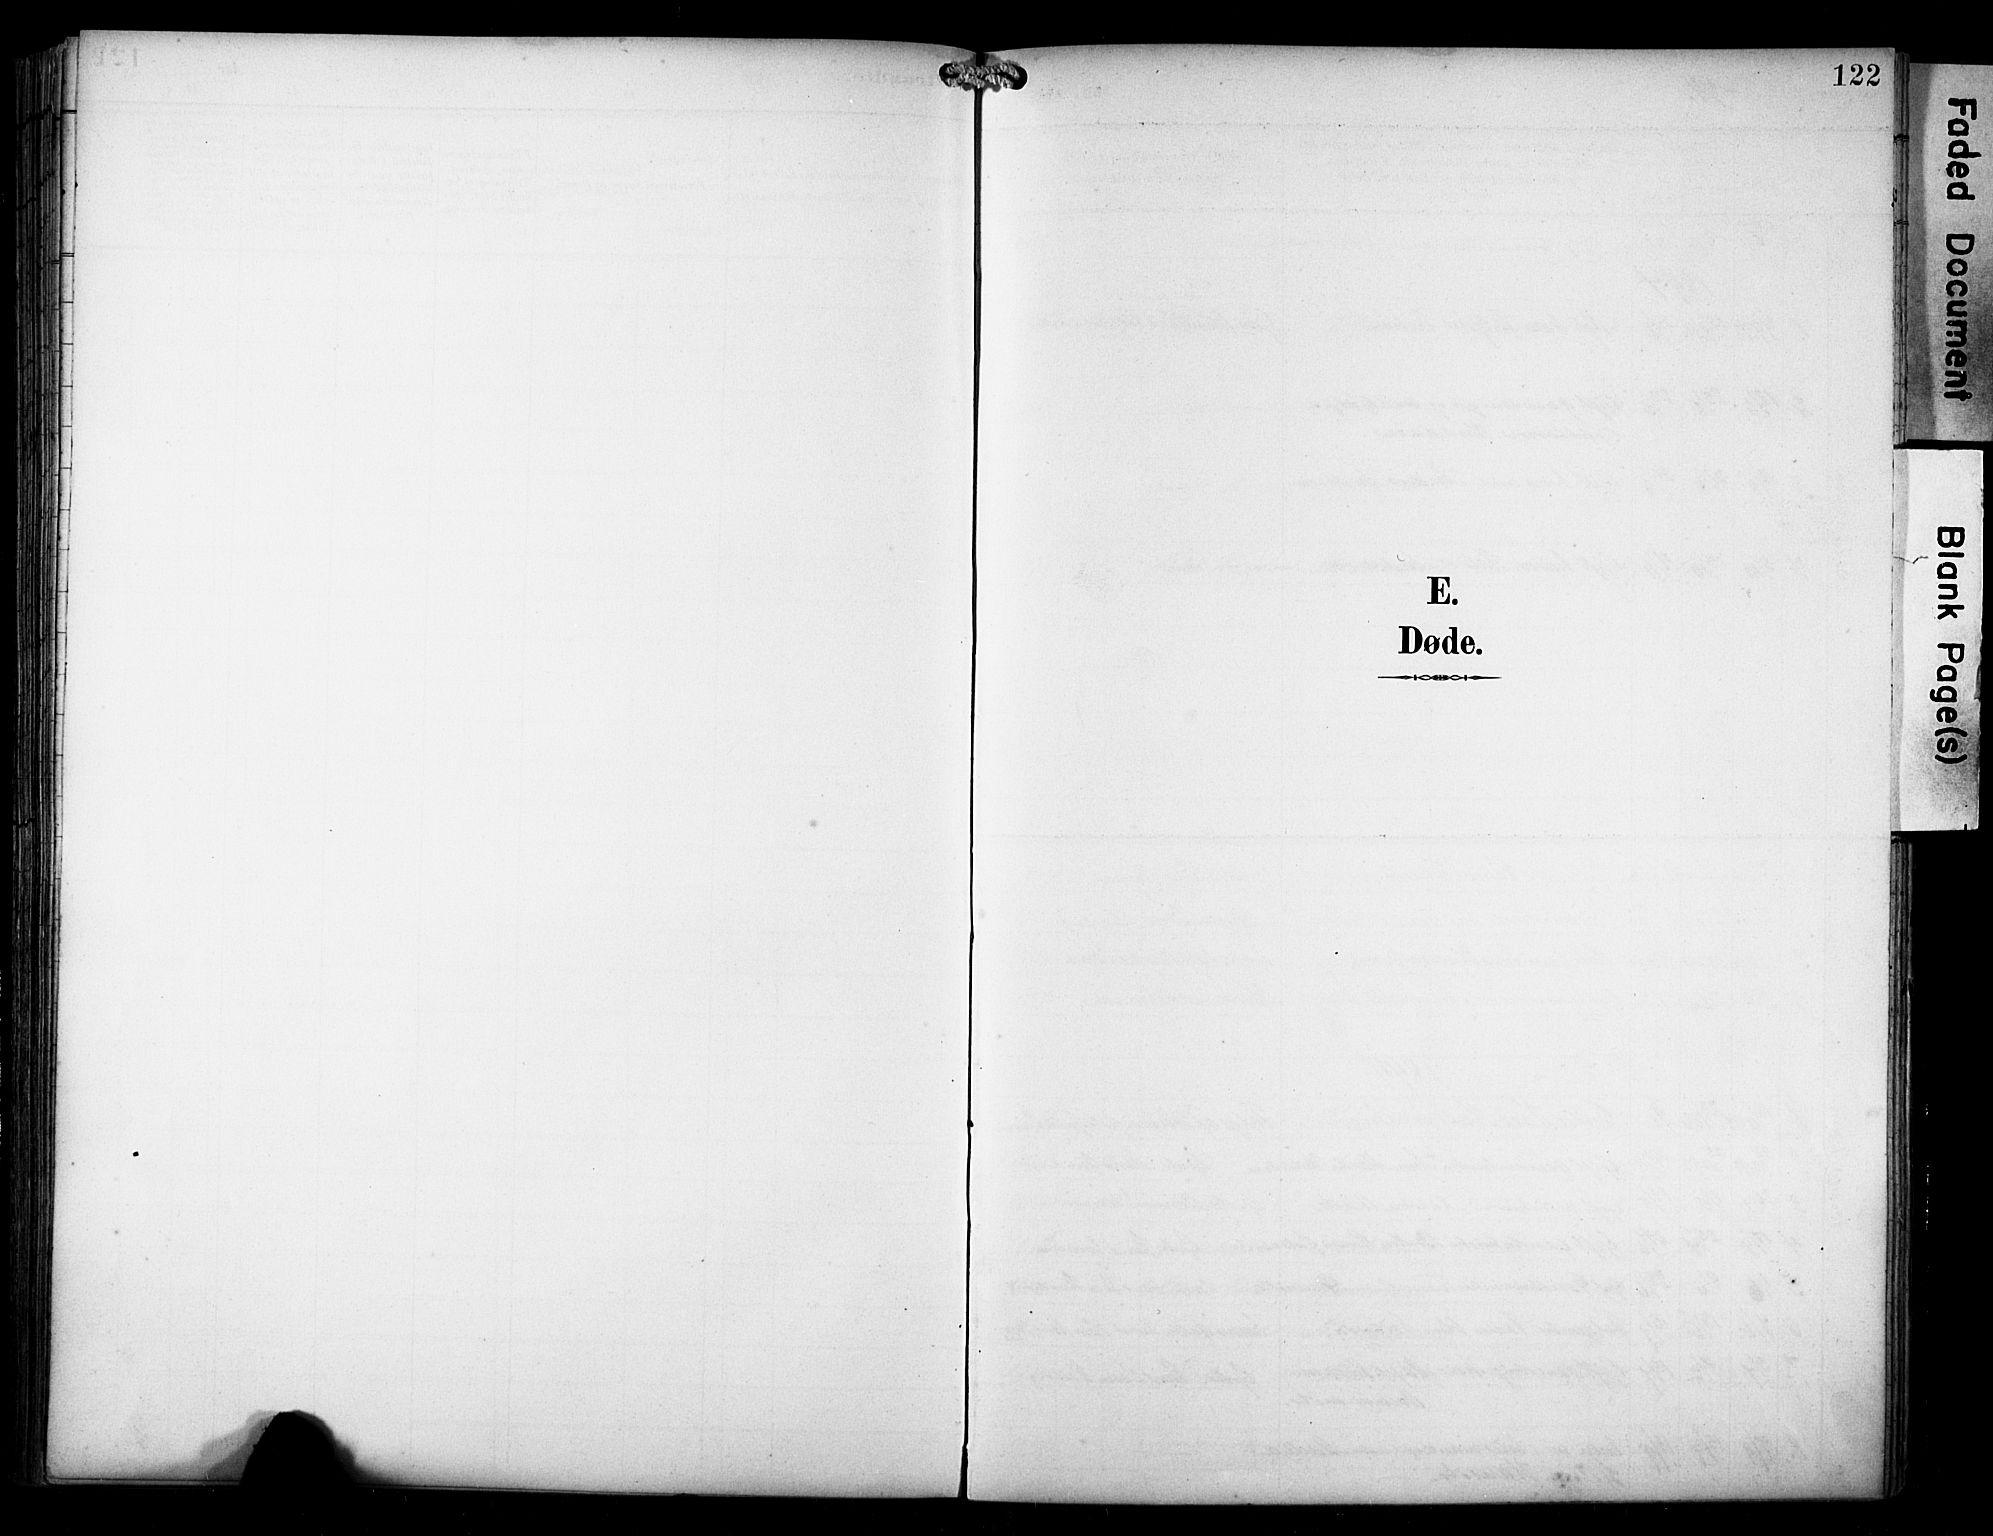 SAST, Avaldsnes sokneprestkontor, H/Ha/Haa/L0016: Ministerialbok nr. A 16, 1893-1918, s. 122